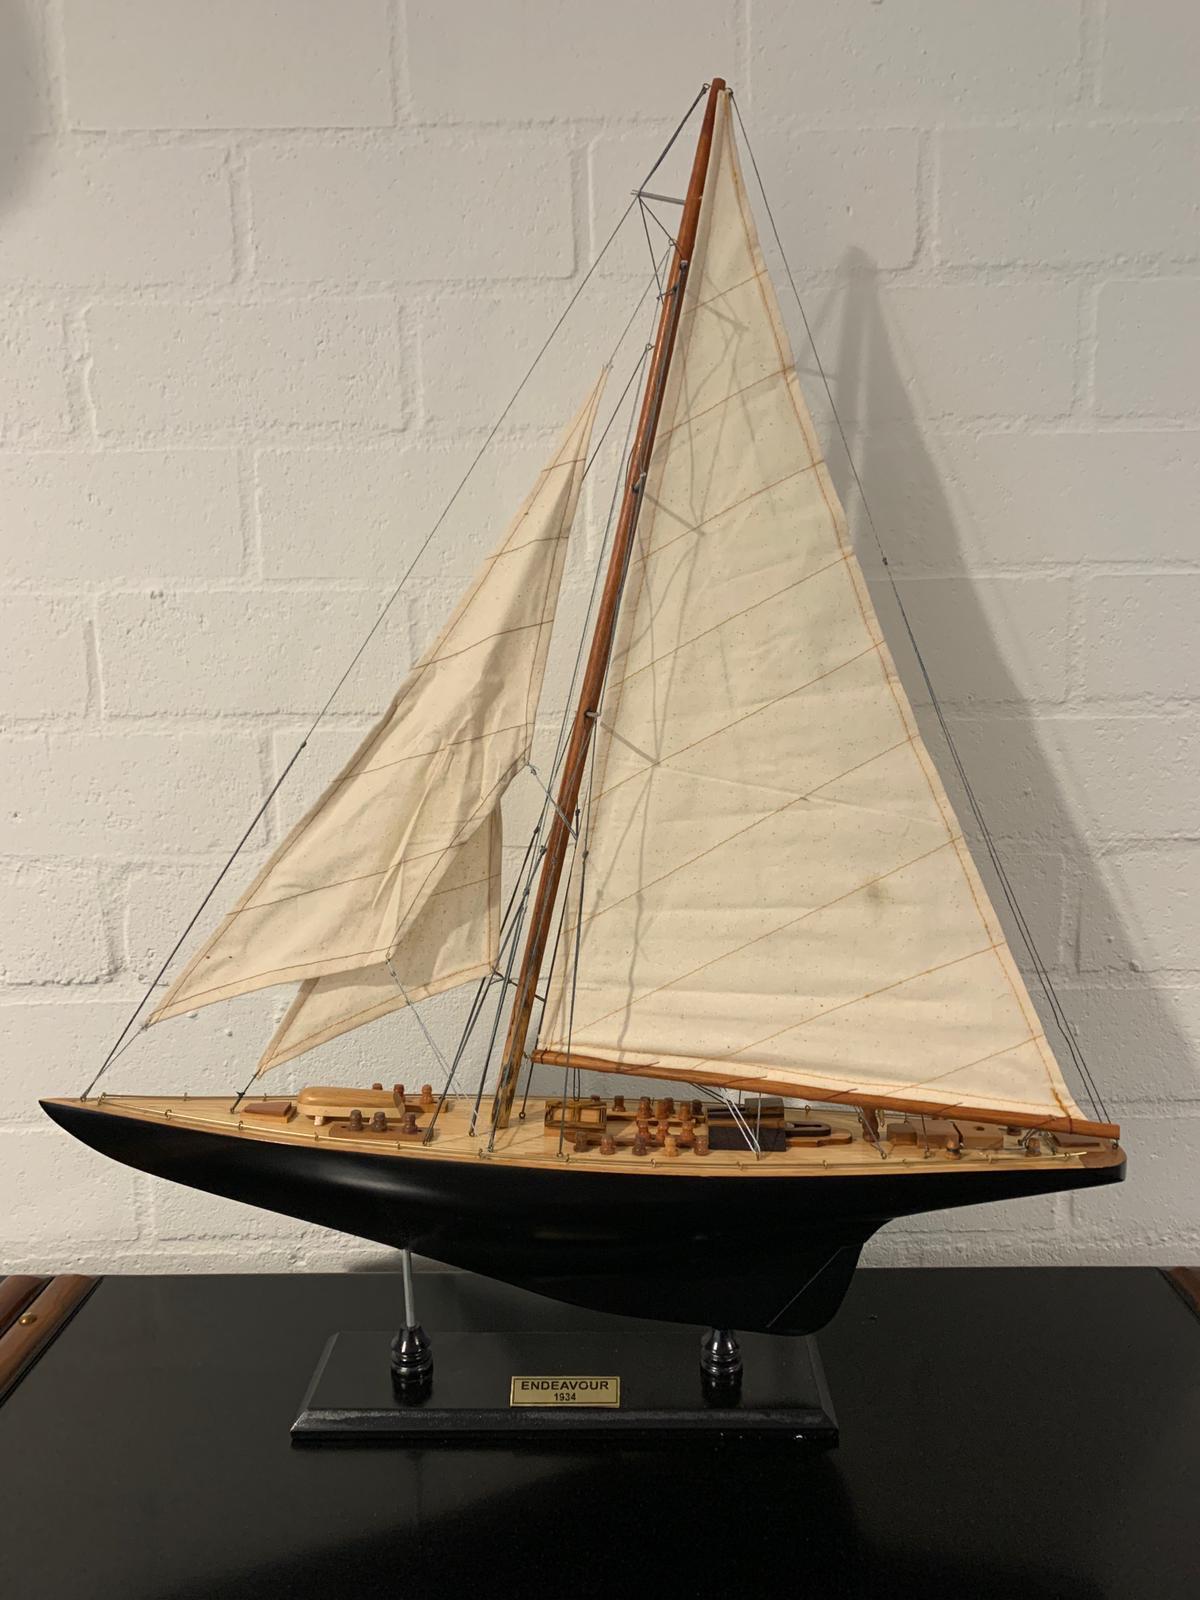 Endeavour Model Yacht Black / White (Standard Range) - Authentic Models (AS155)